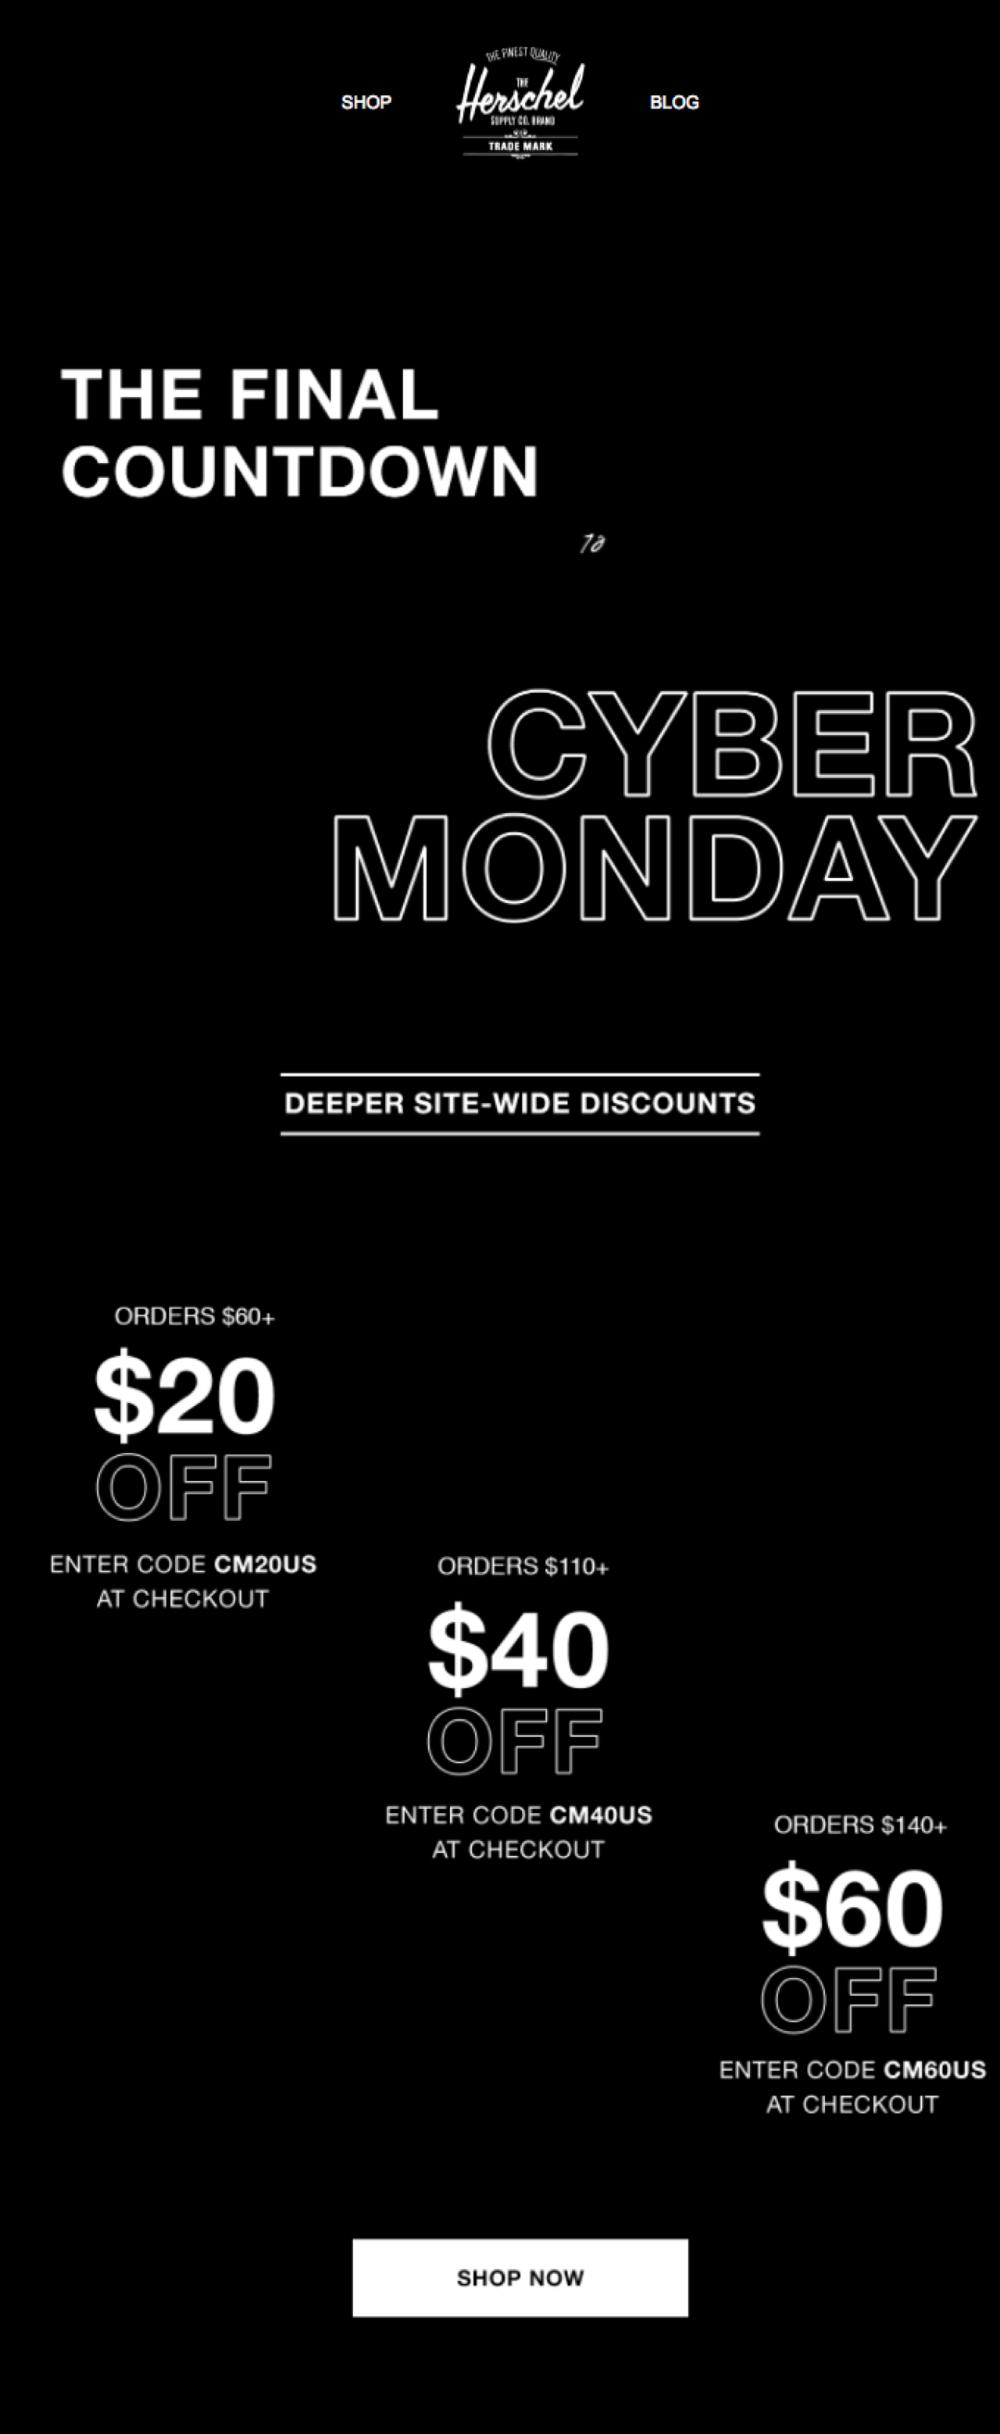 Black Friday Cyber Monday Email Checklist Mailerlite In 2020 Cyber Monday Email Cyber Monday Black Friday Marketing